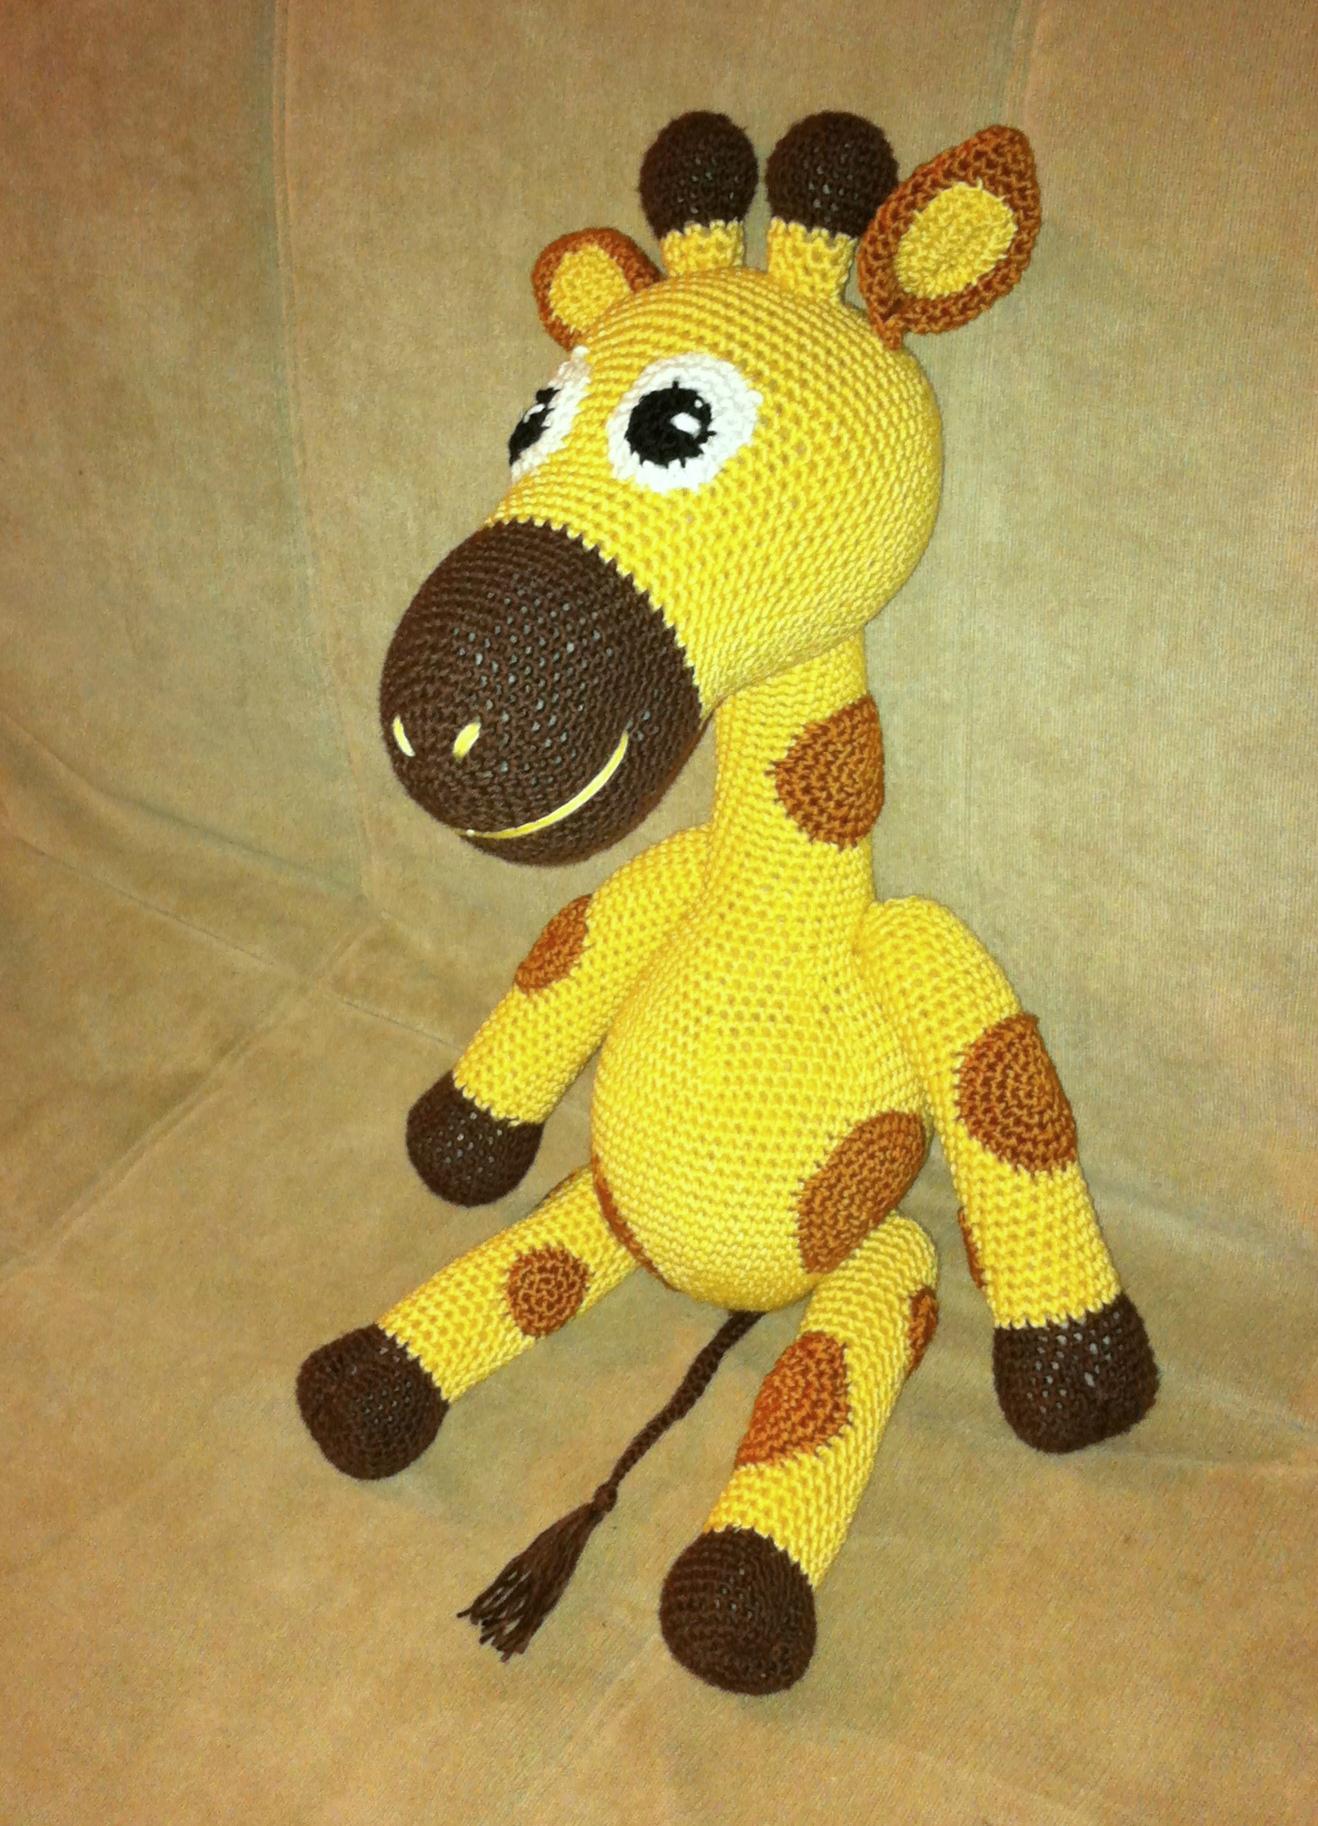 petite girafe assise profil gauche